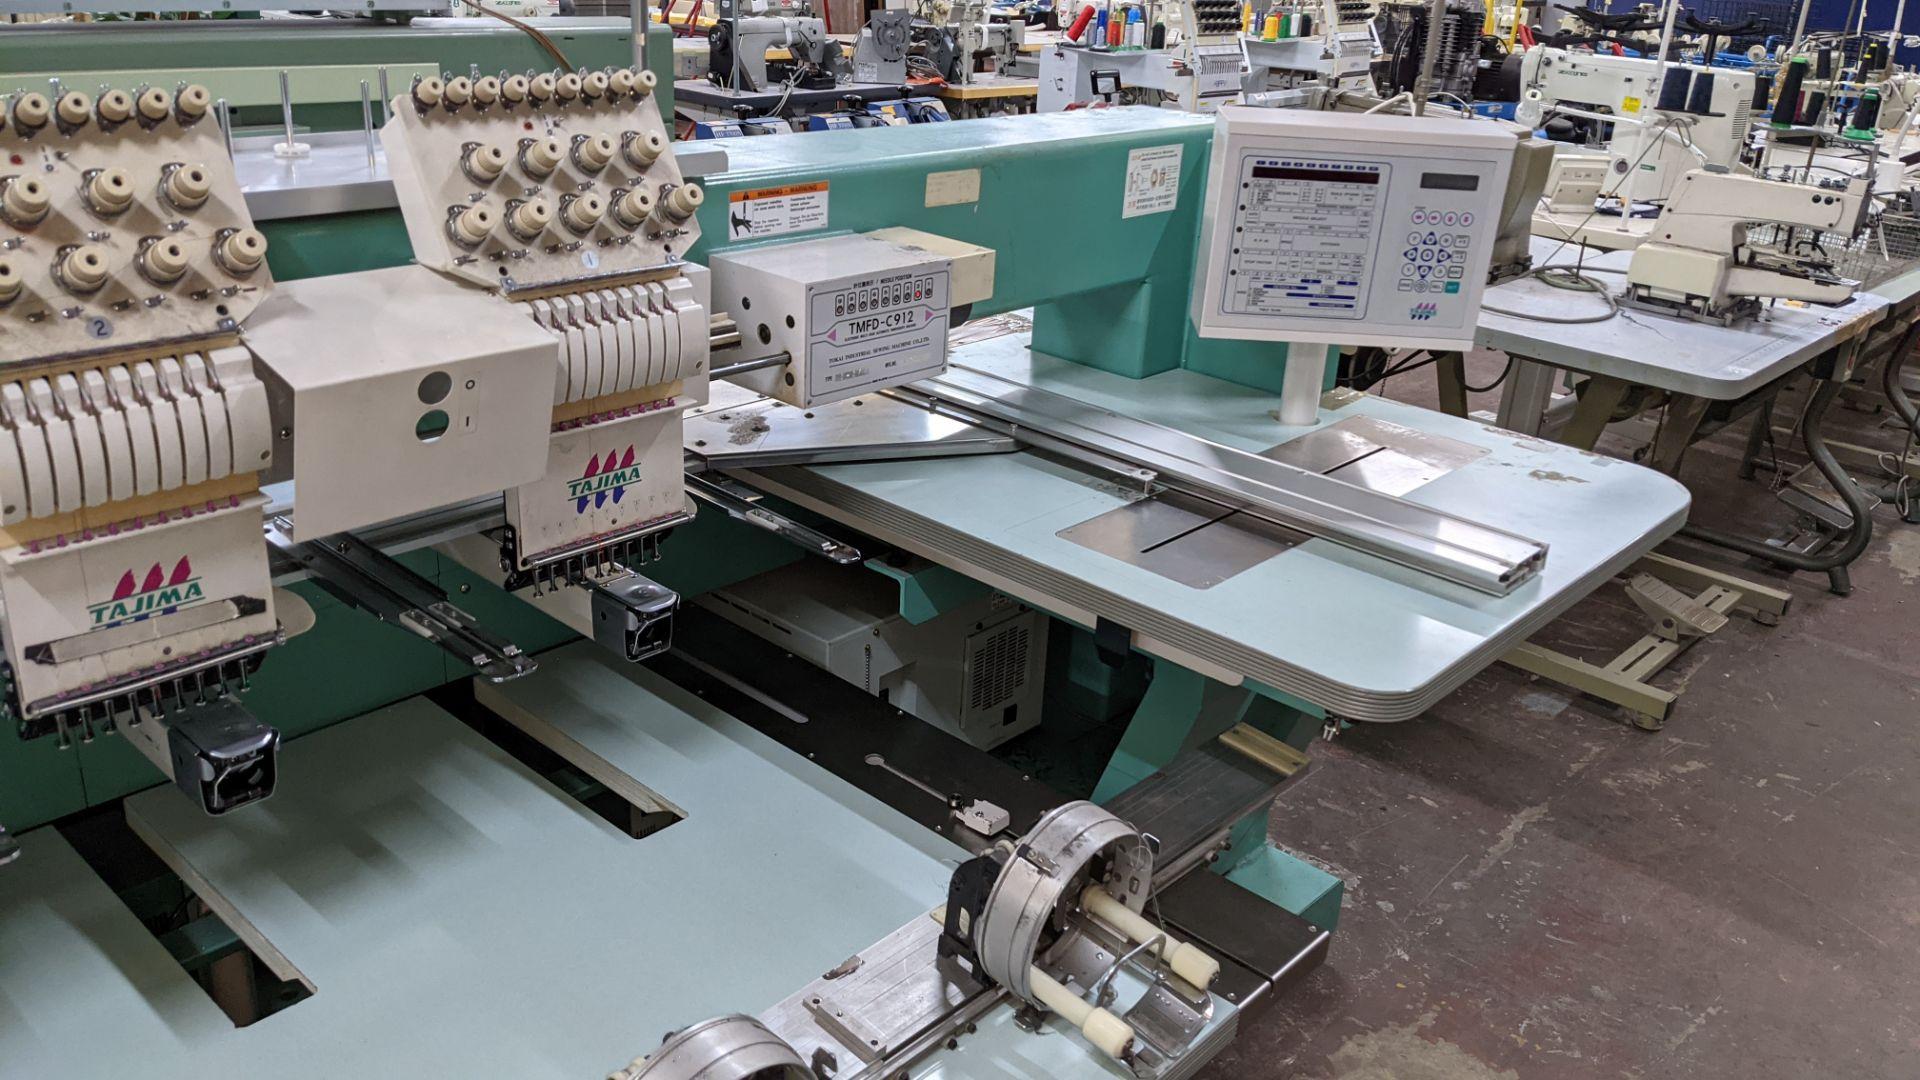 Tokai Tajima model TMFD-C912 electronic 12 head embroidery machine, type 2-2FX - Image 8 of 27